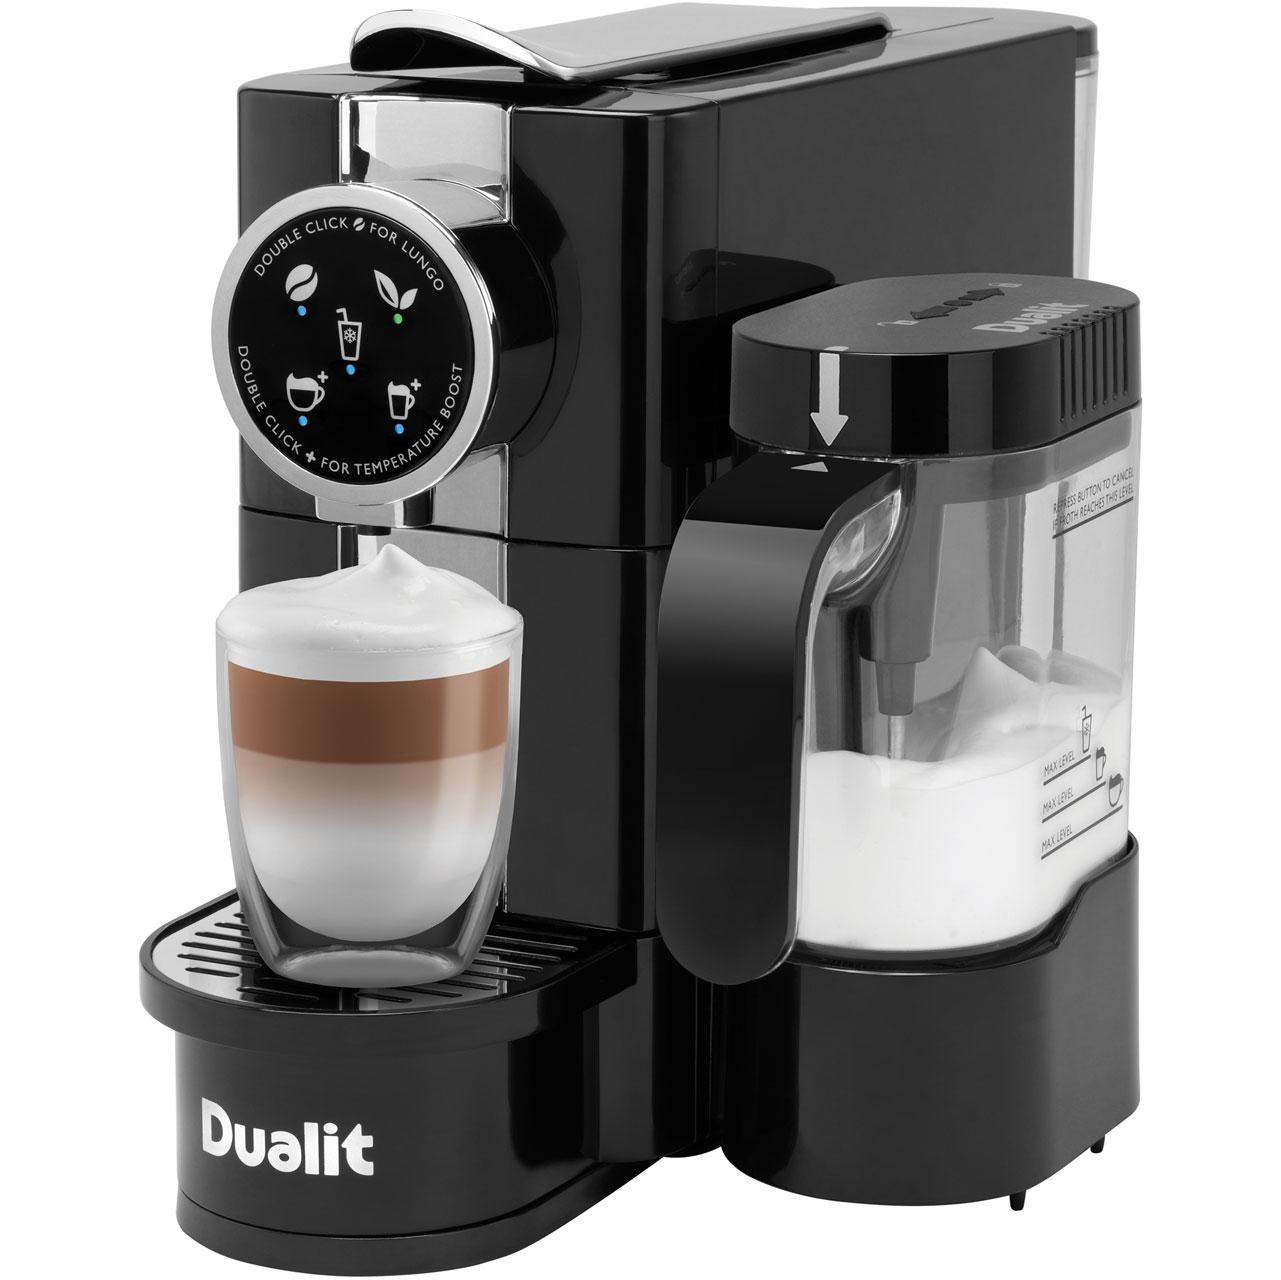 Dualit 85180 Pod Coffee Machine Black Chrome